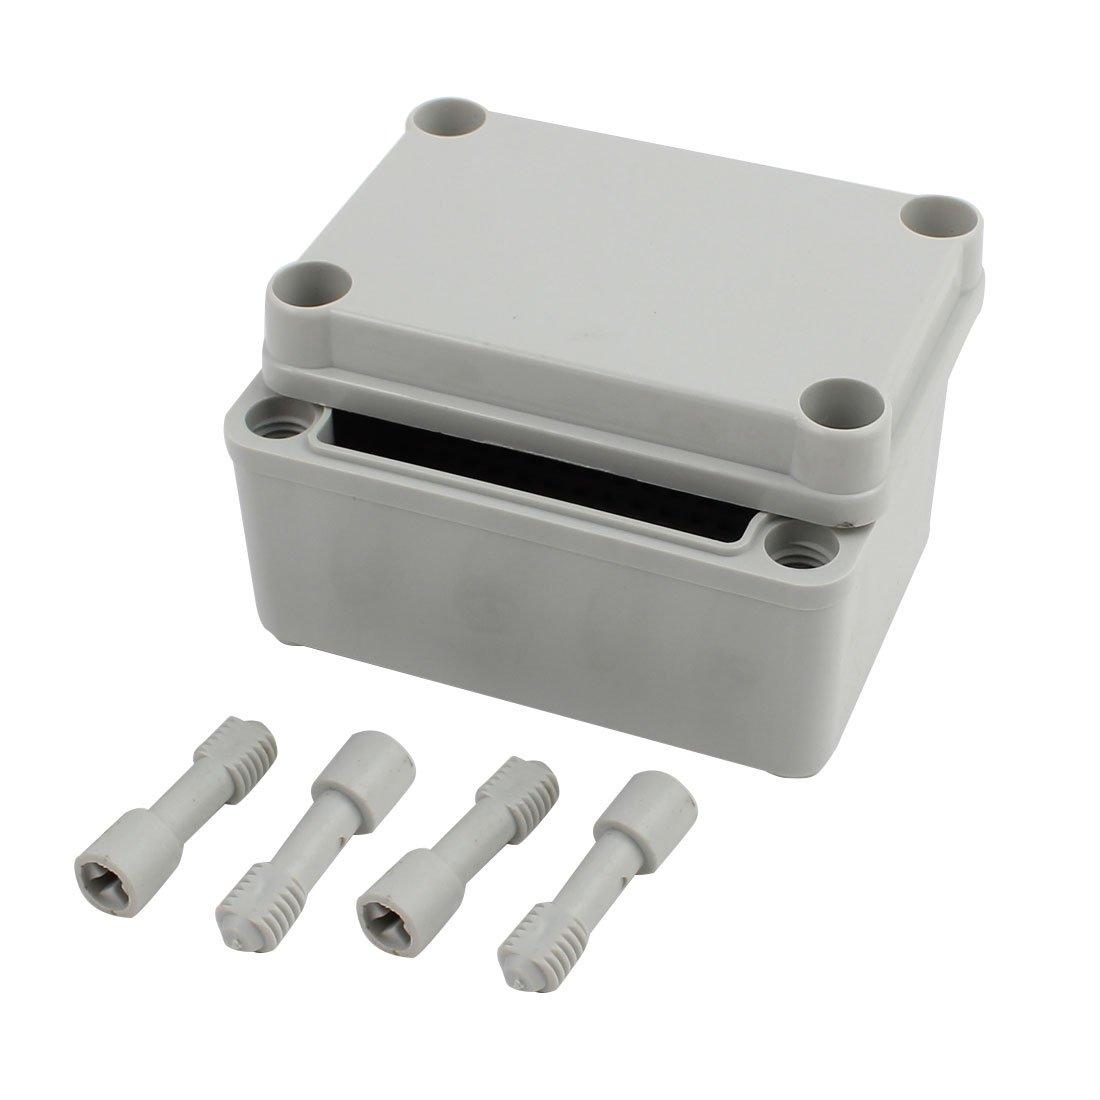 uxcell 95mm x 65mm x 55mm Dustproof IP65 Junction Box DIY Case Enclosure Gray